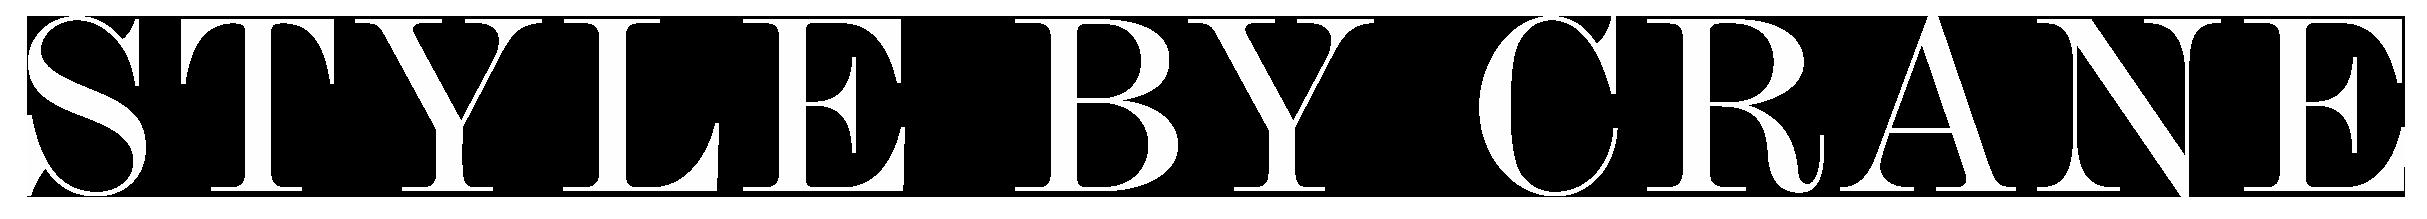 style-by-crane-logo-light